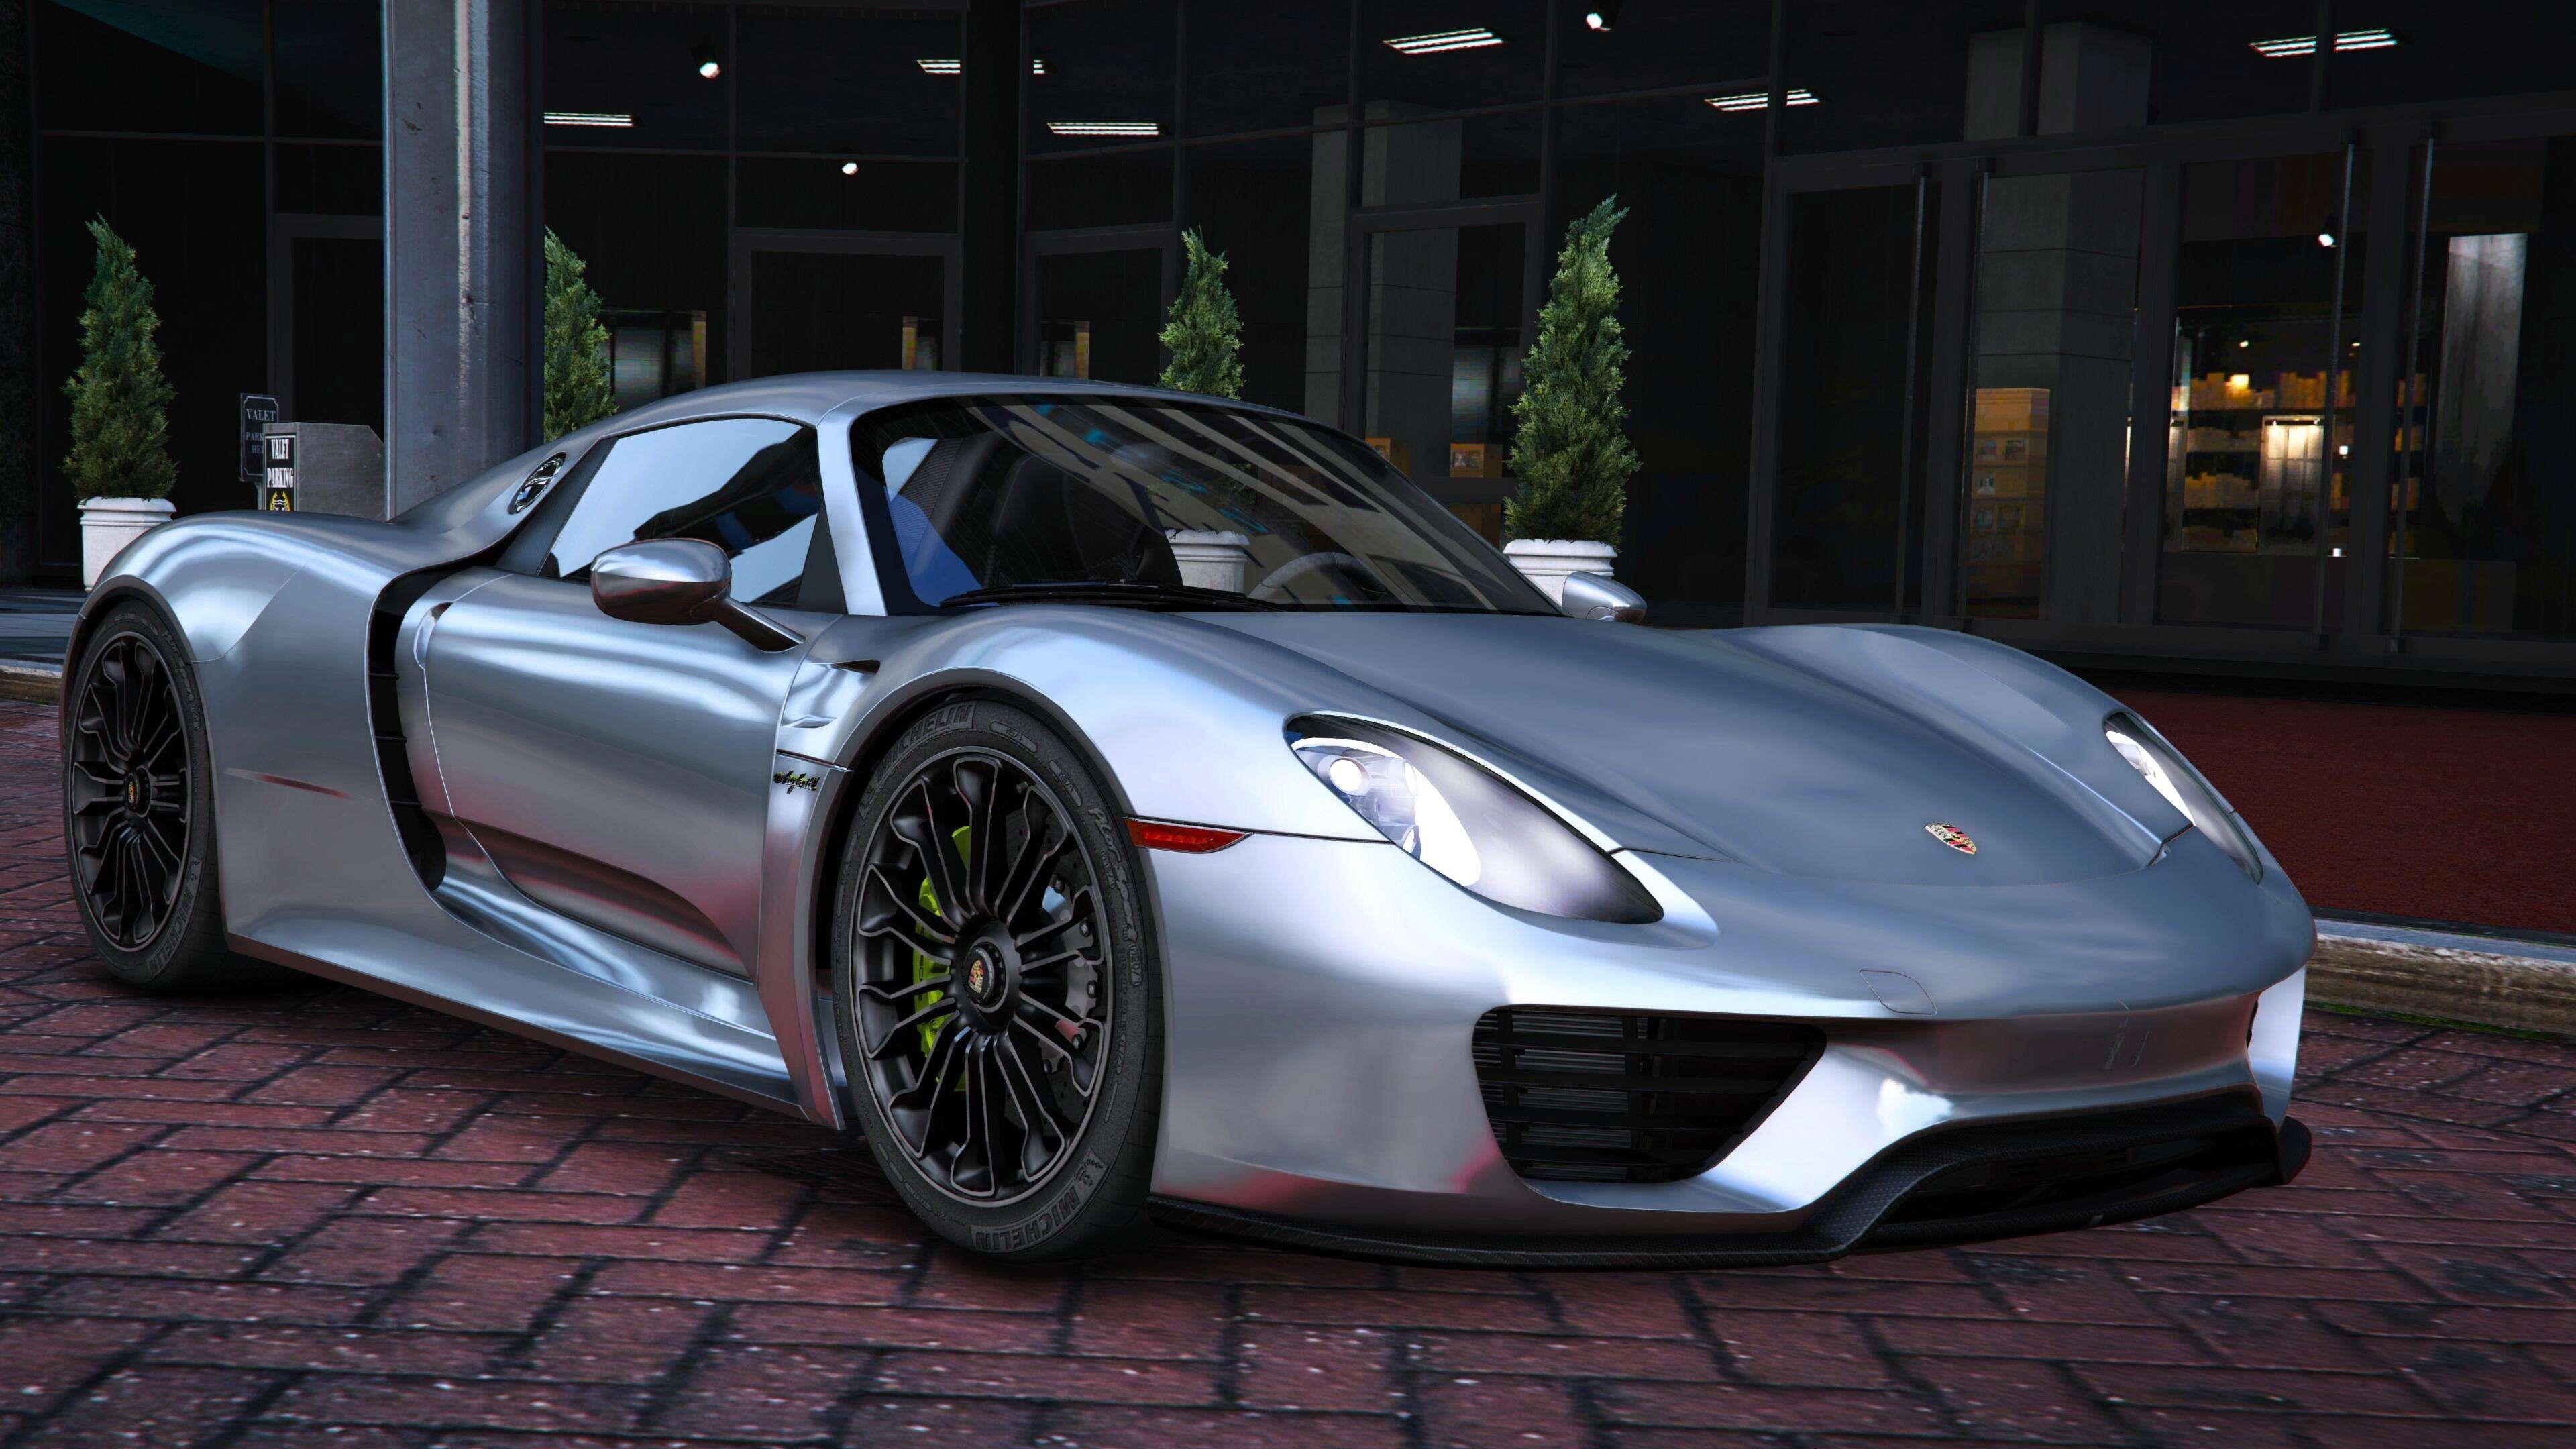 Porsche 918 spyder US$845,000 (~ €611,000 or GB£511,000). Horsepower ...